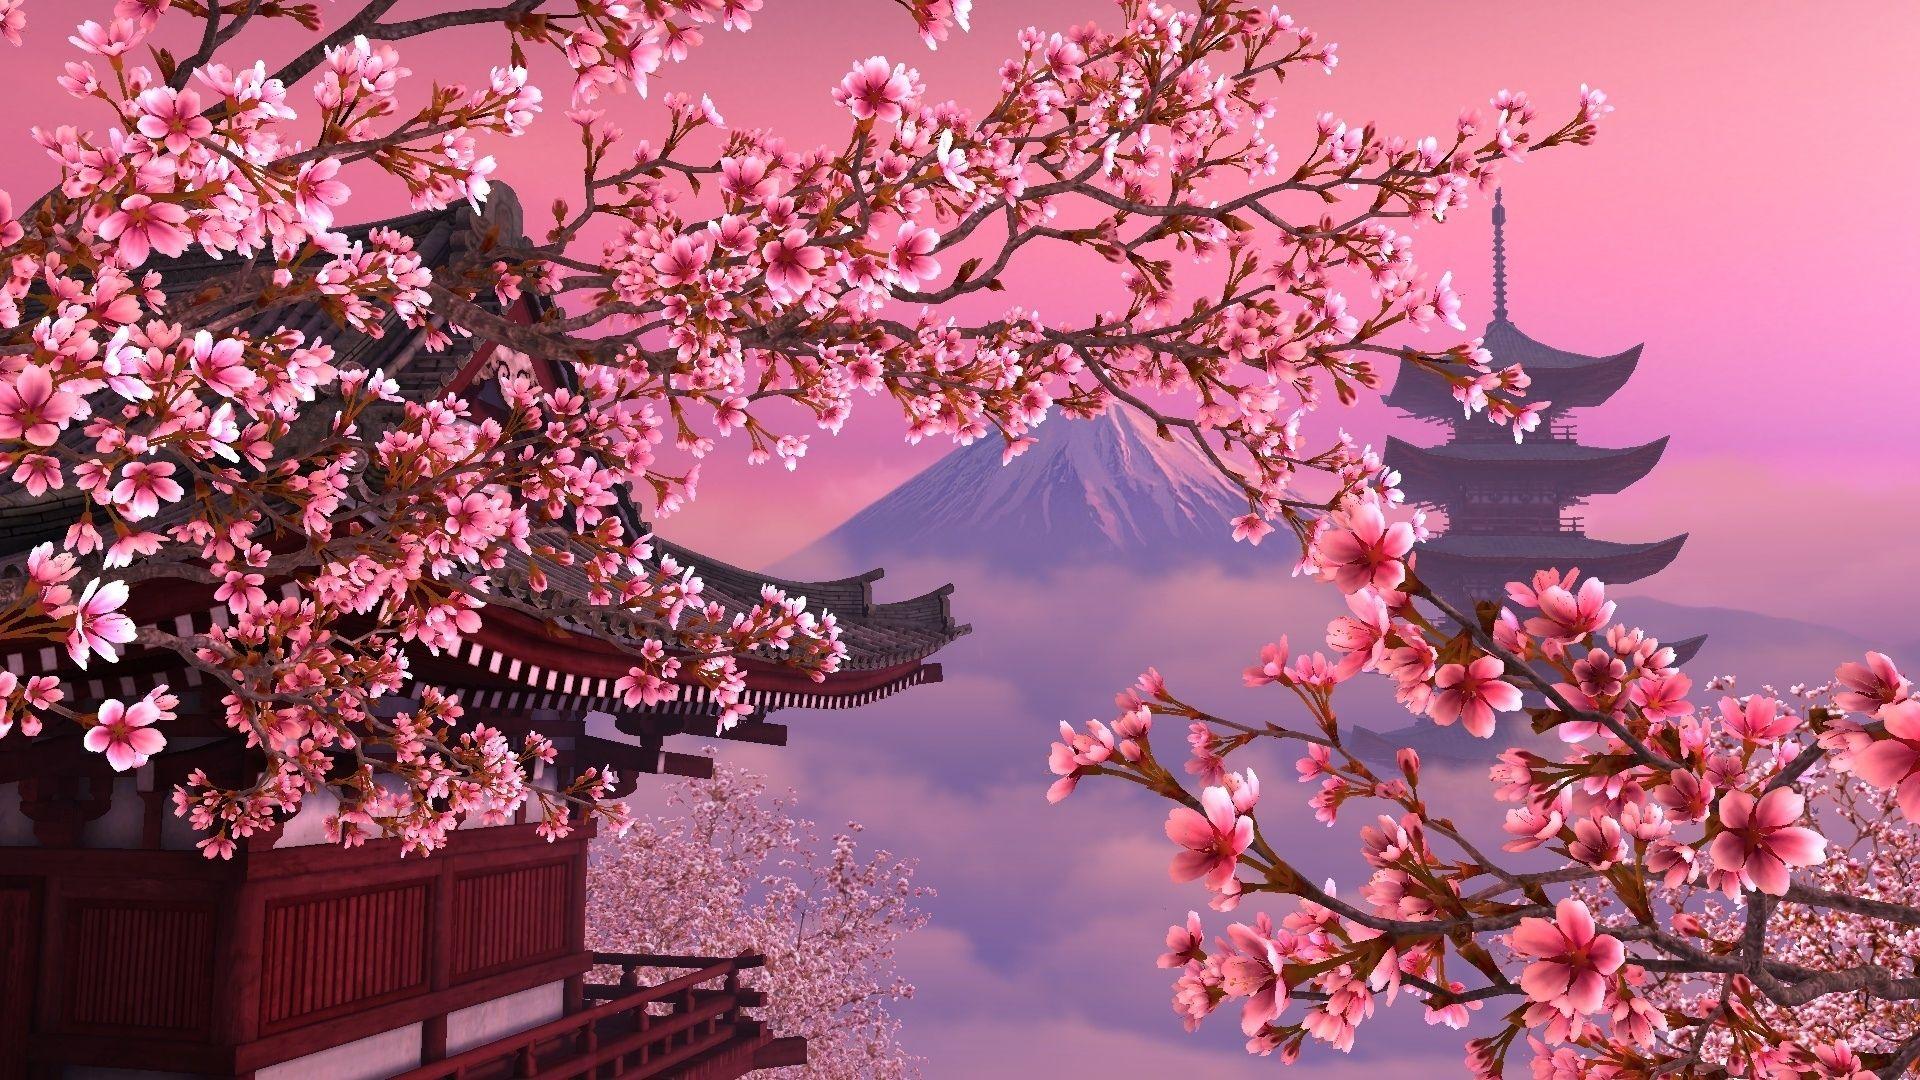 Sakura Wallpaper K Android Apps on Google Play Cherry